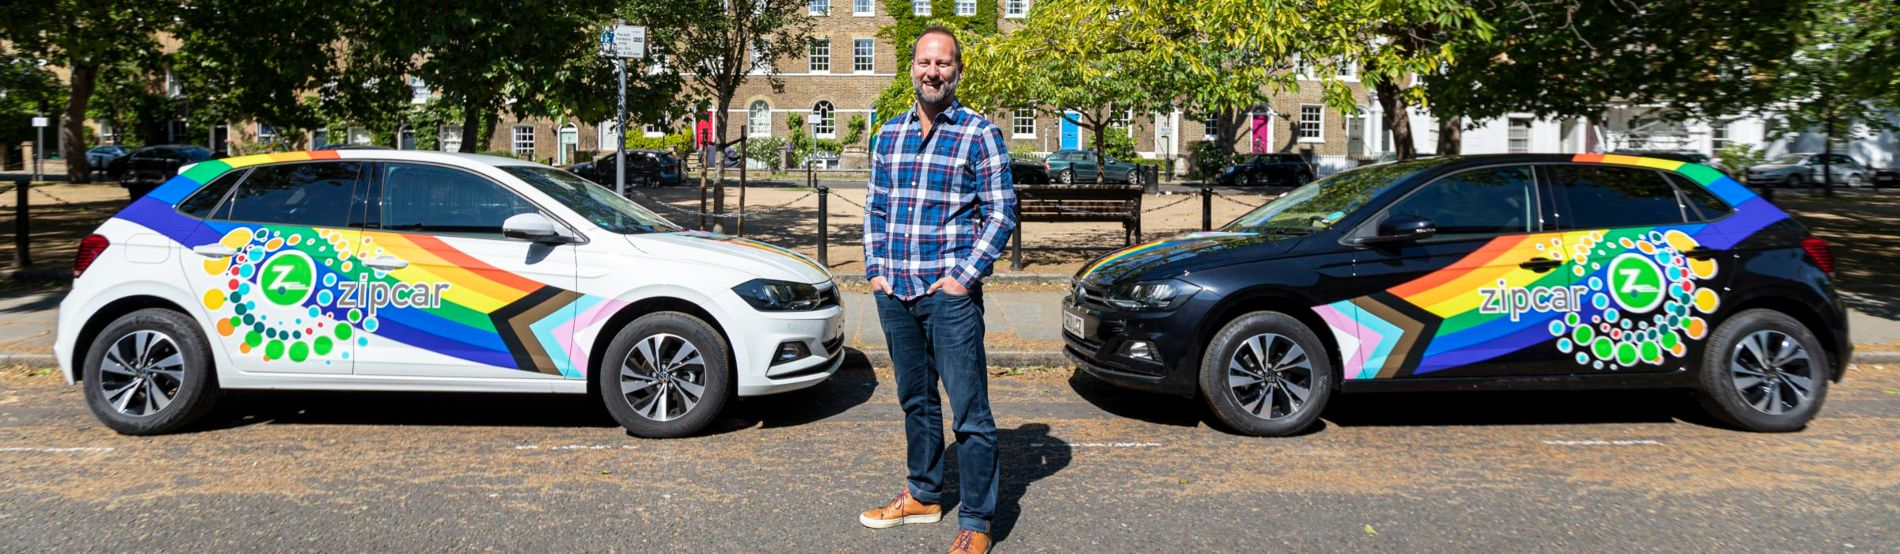 James Taylor, Zipcar UK General Manager